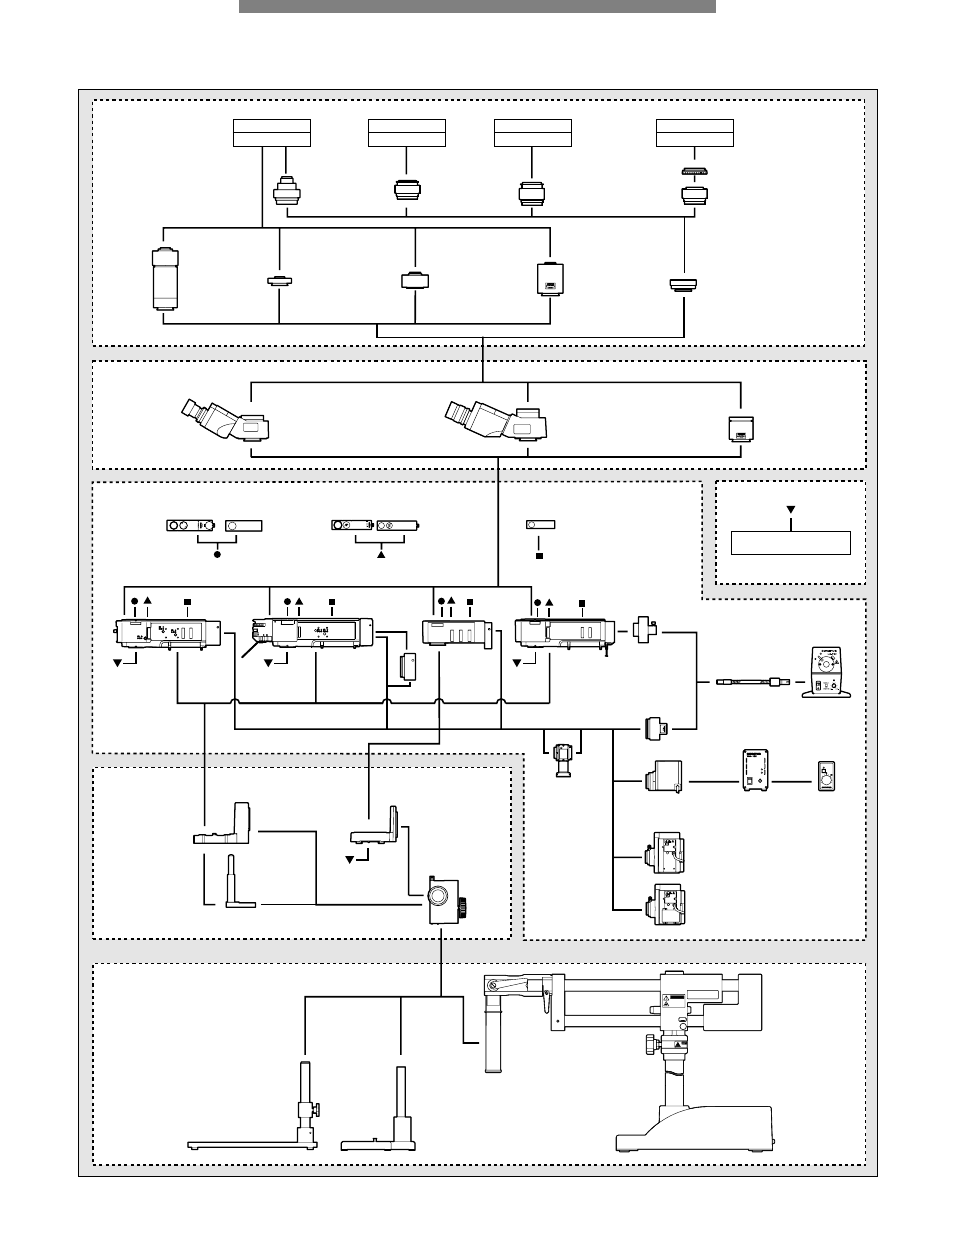 System diagram, 56 shutter shutter 5 6 shutter, Nd fs as